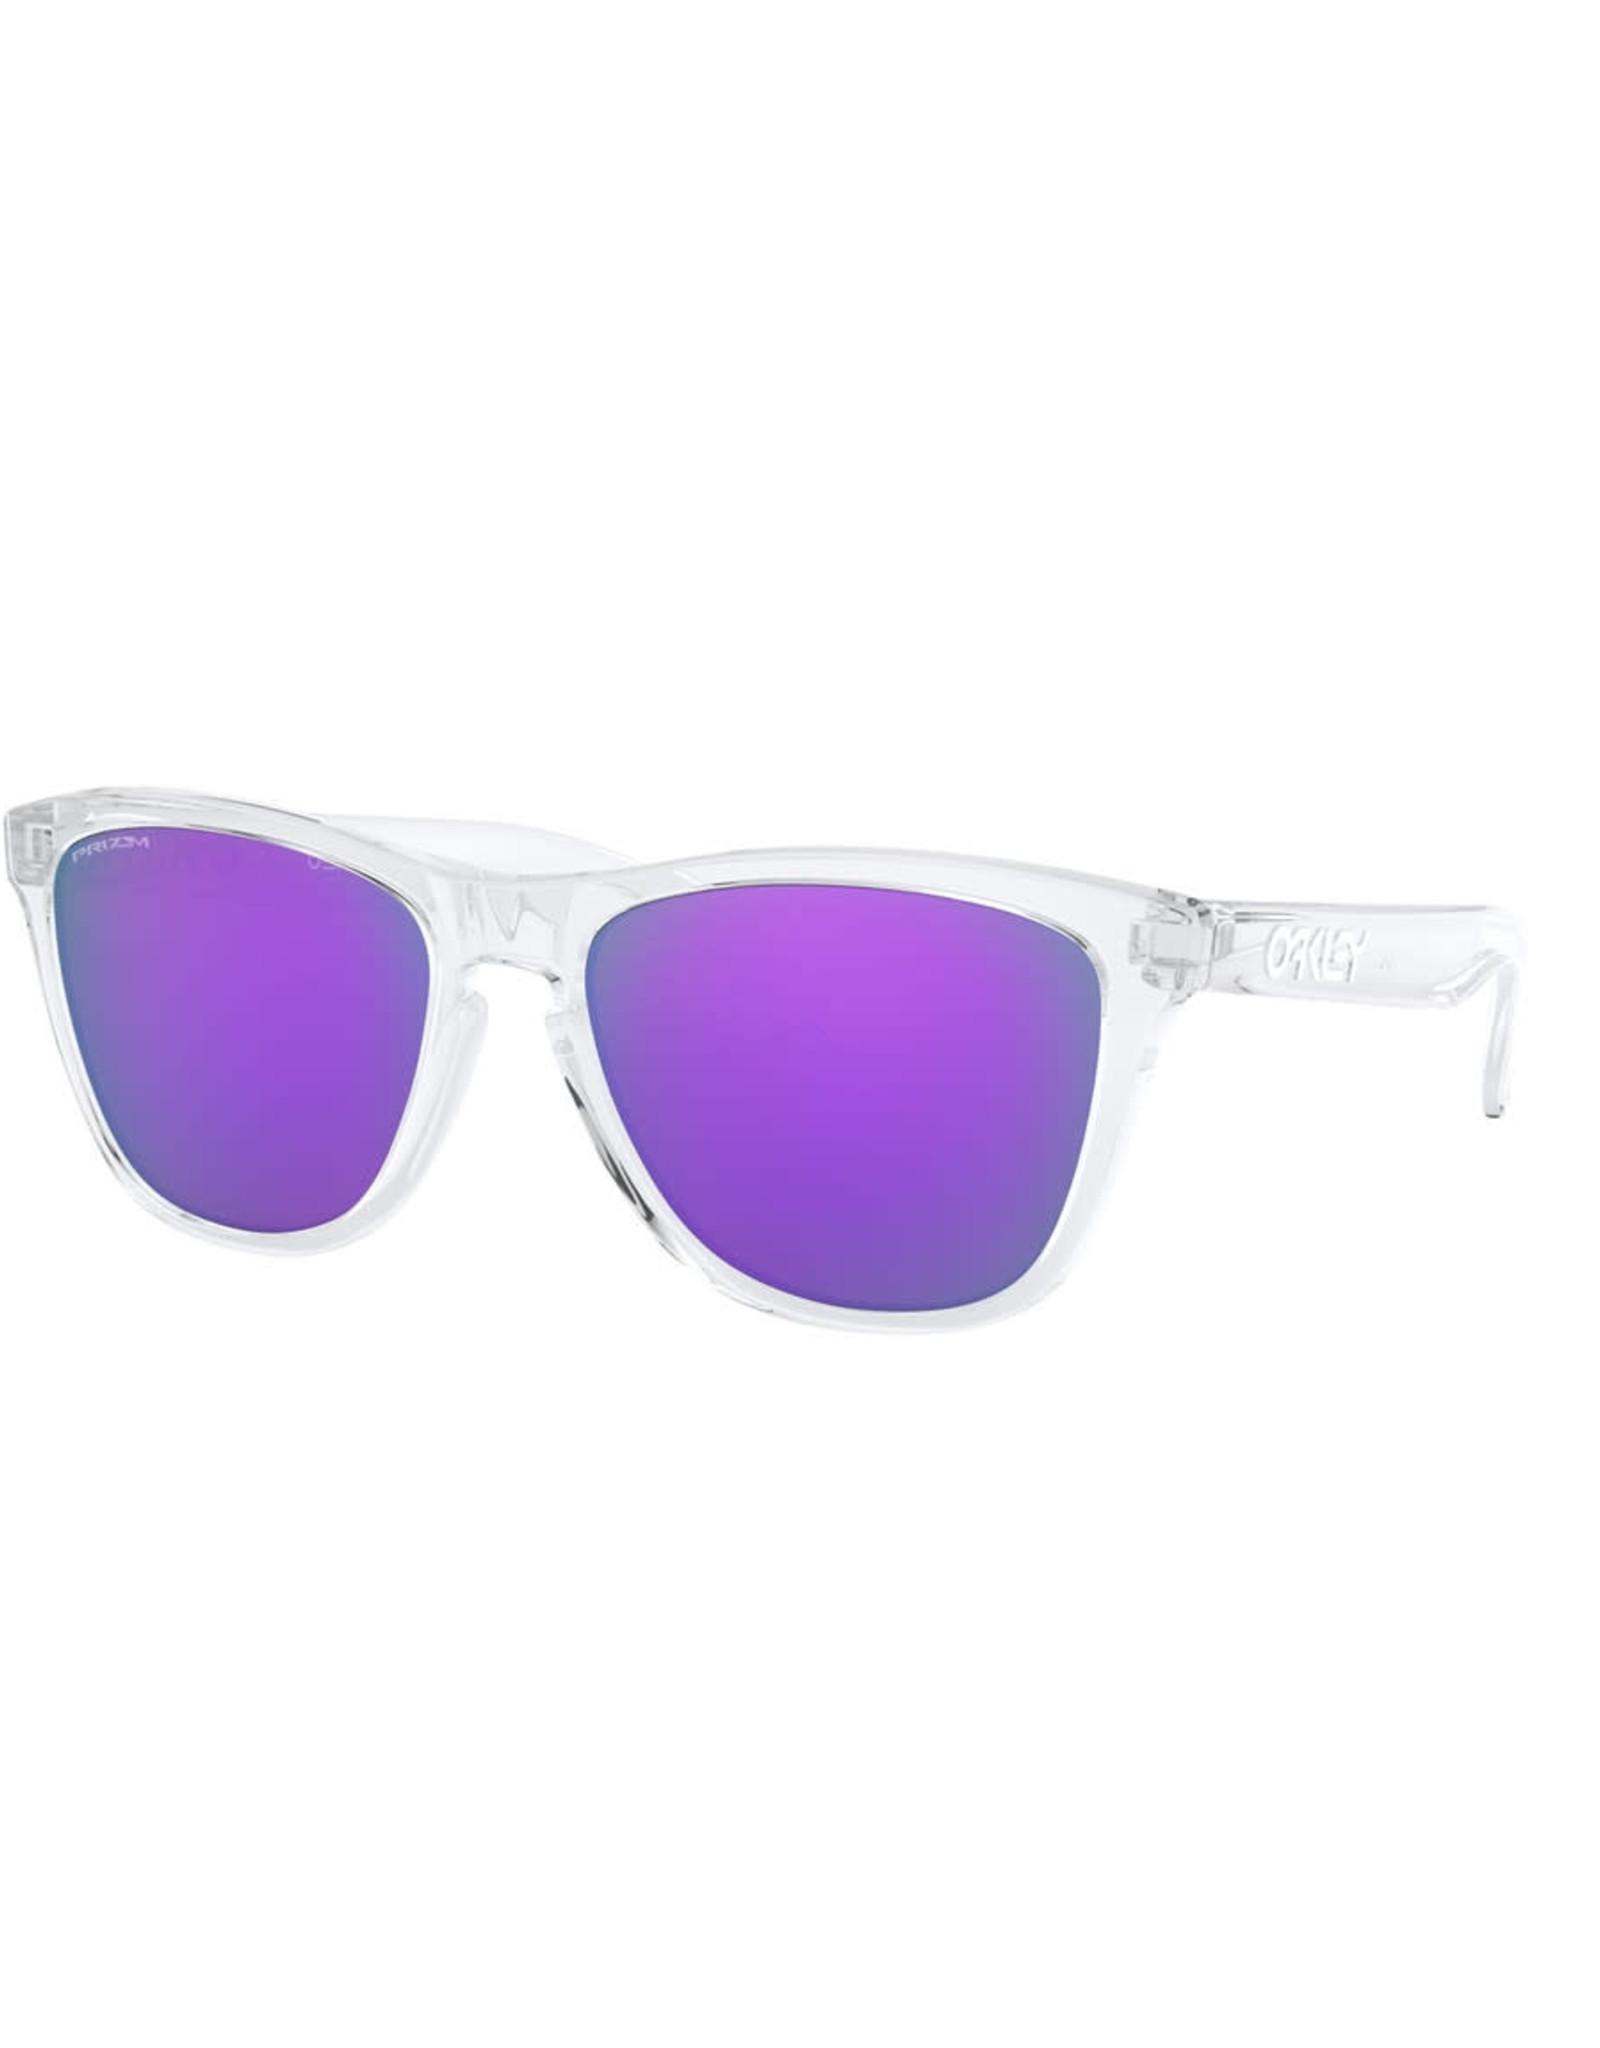 Oakley FROGSKINS Polished Clear, Prizm Violet Iridium